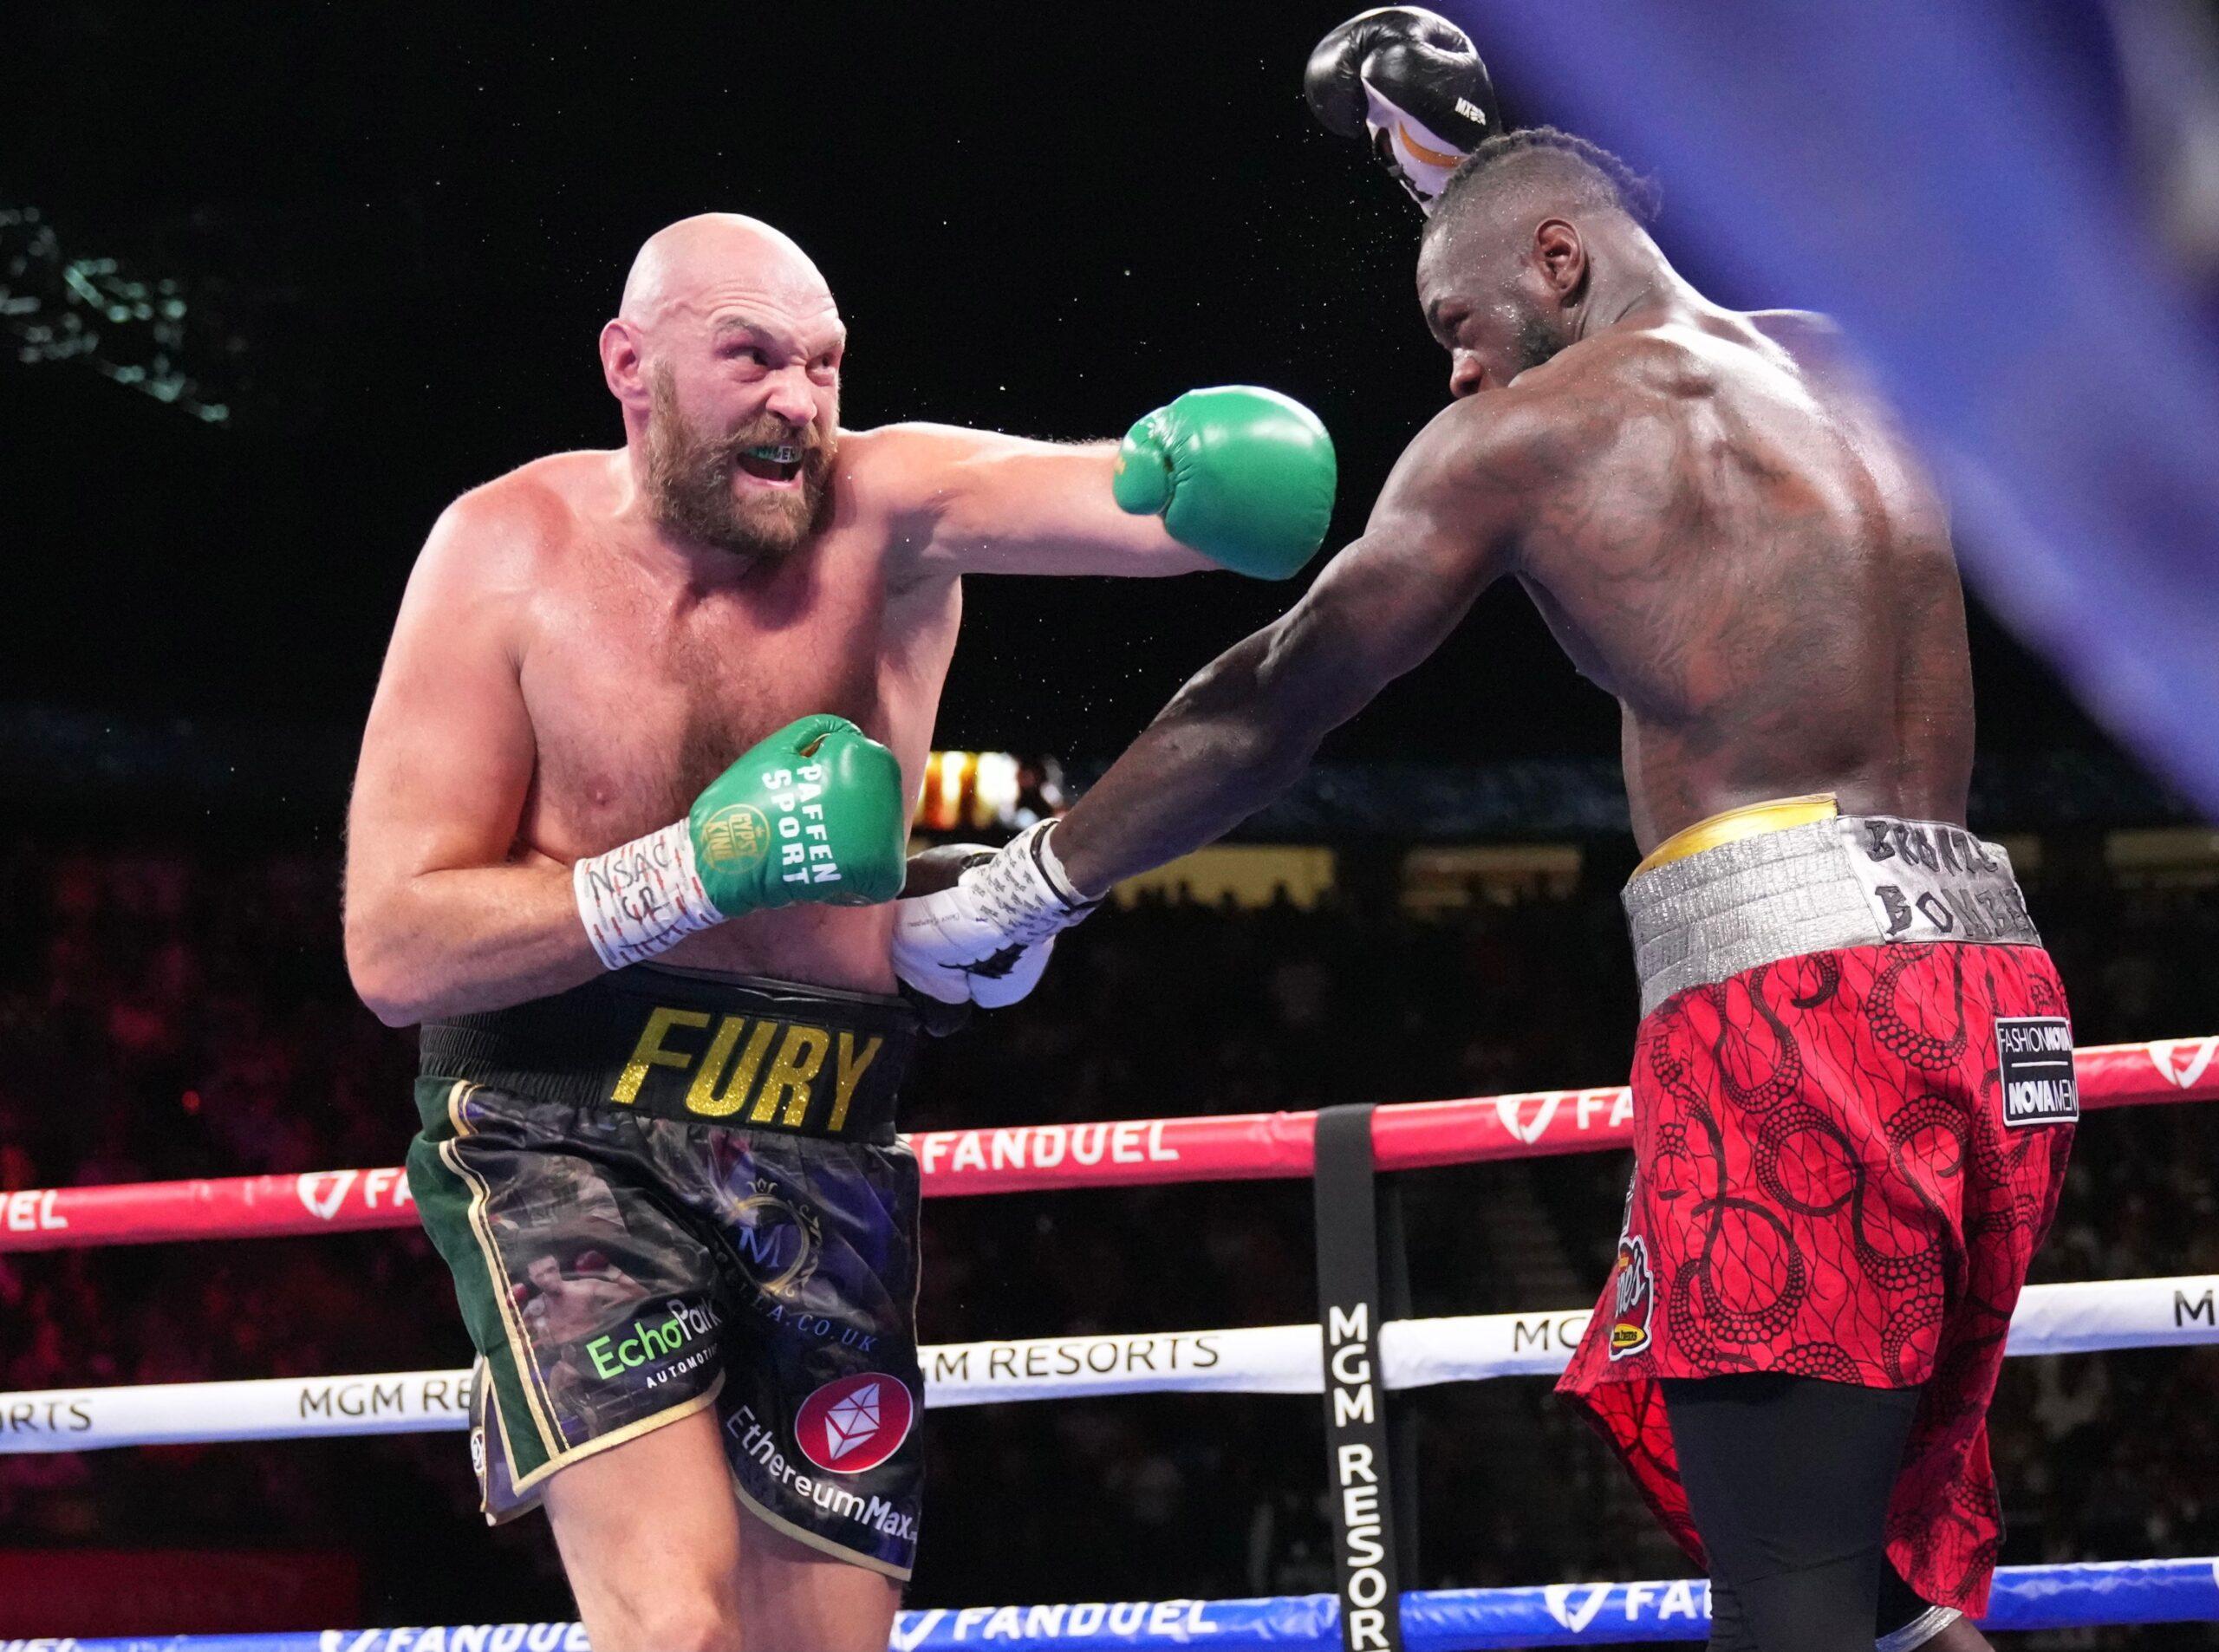 Fury Knocks Out Wilder to Retain WBC Heavyweight Title